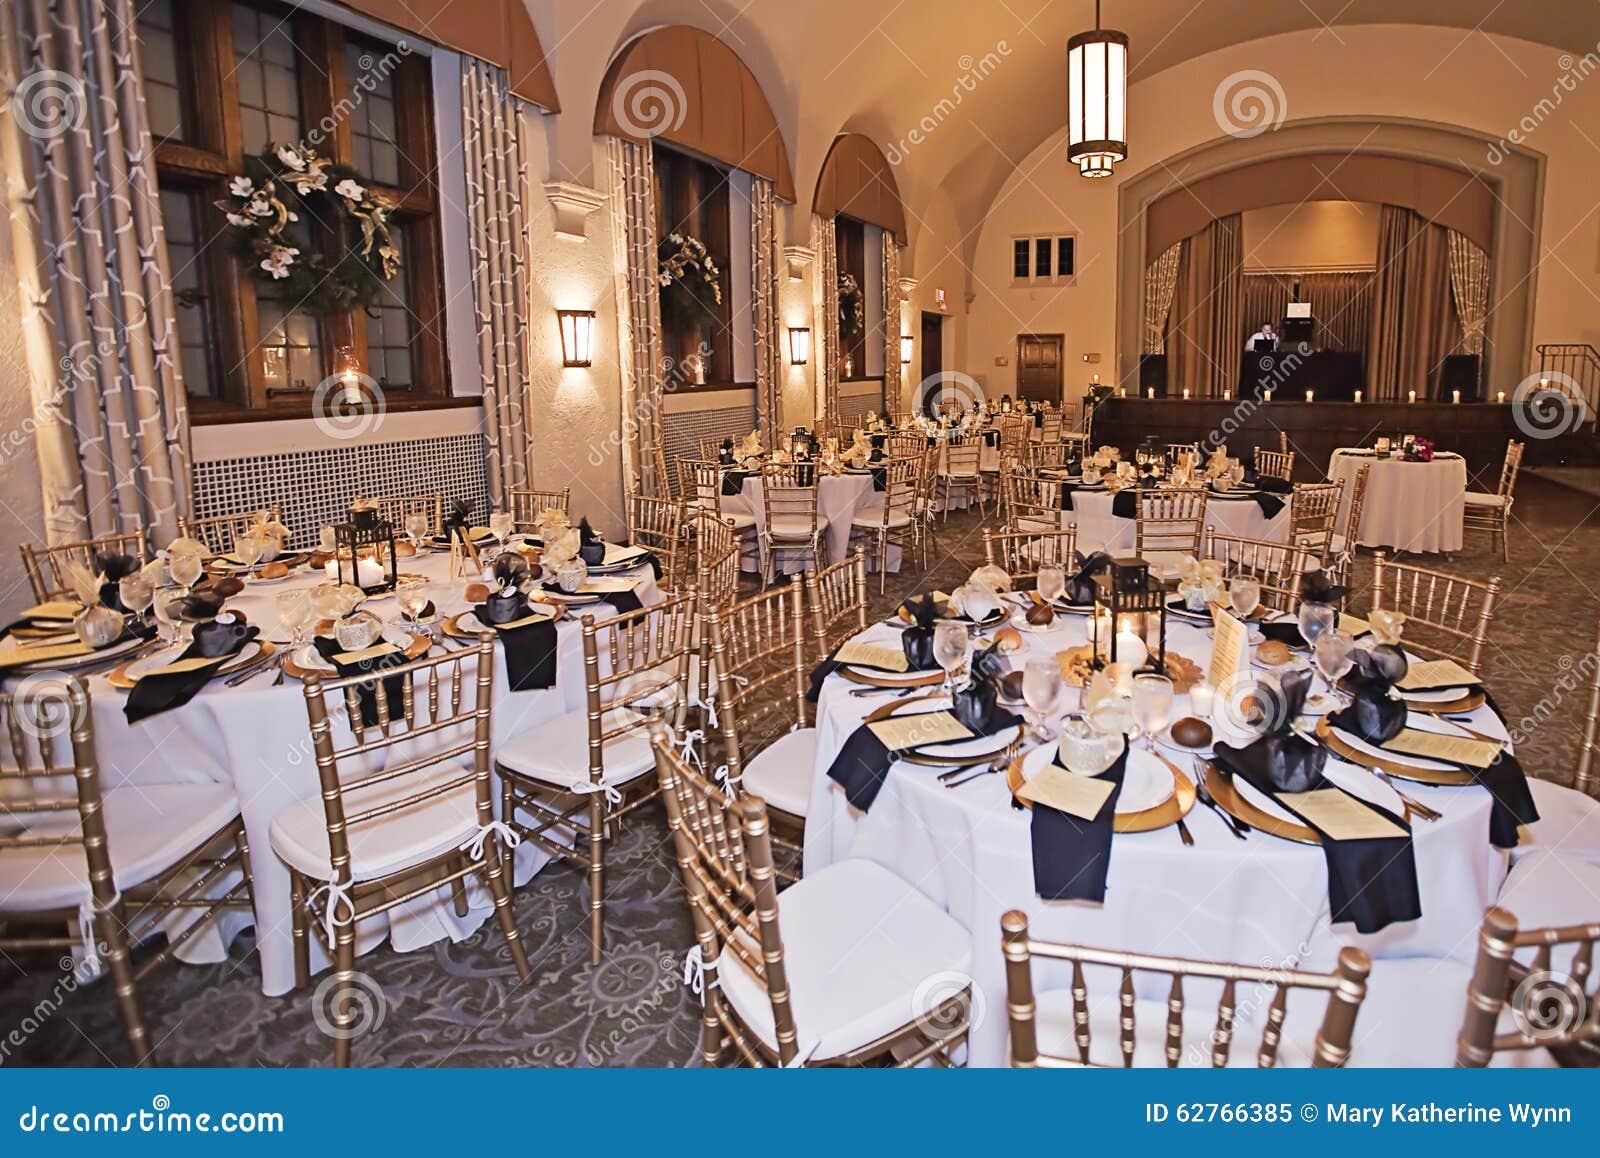 Wedding Reception Venue At Night Stock Image Image Of Luxury